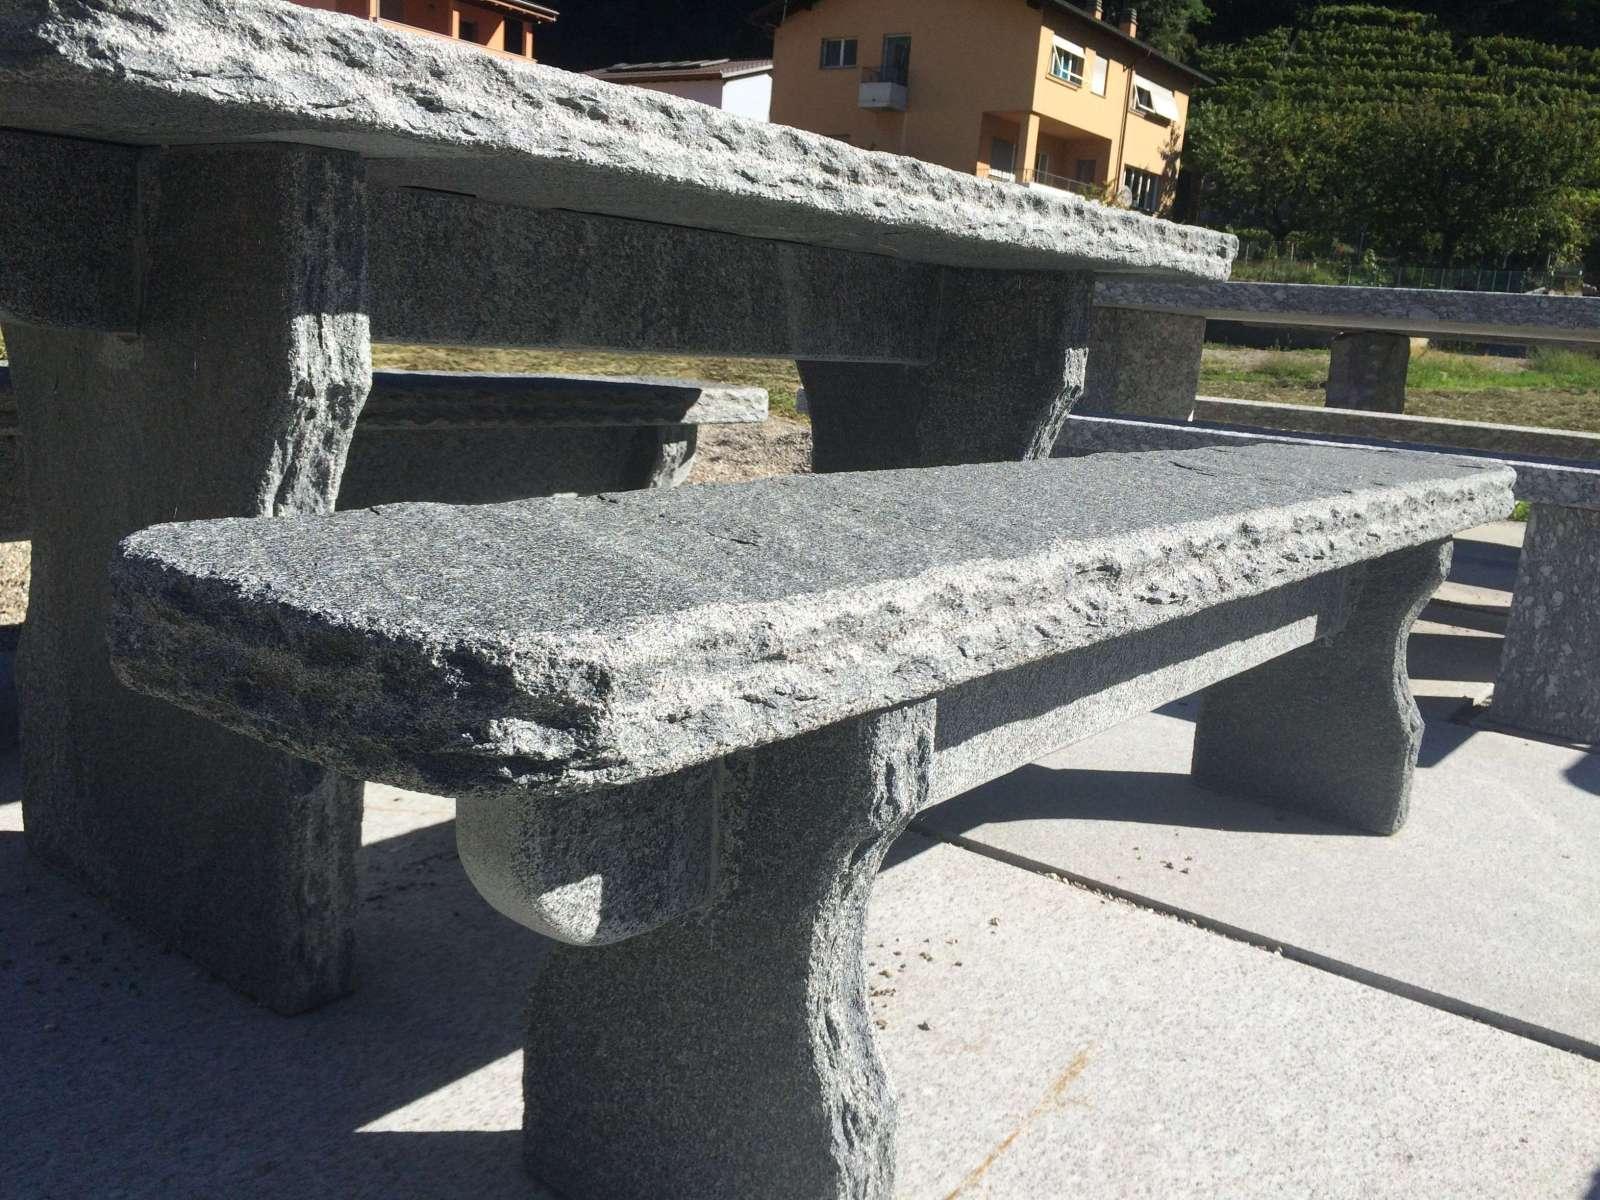 Granittisch-Grotto-Kanten_Gerade